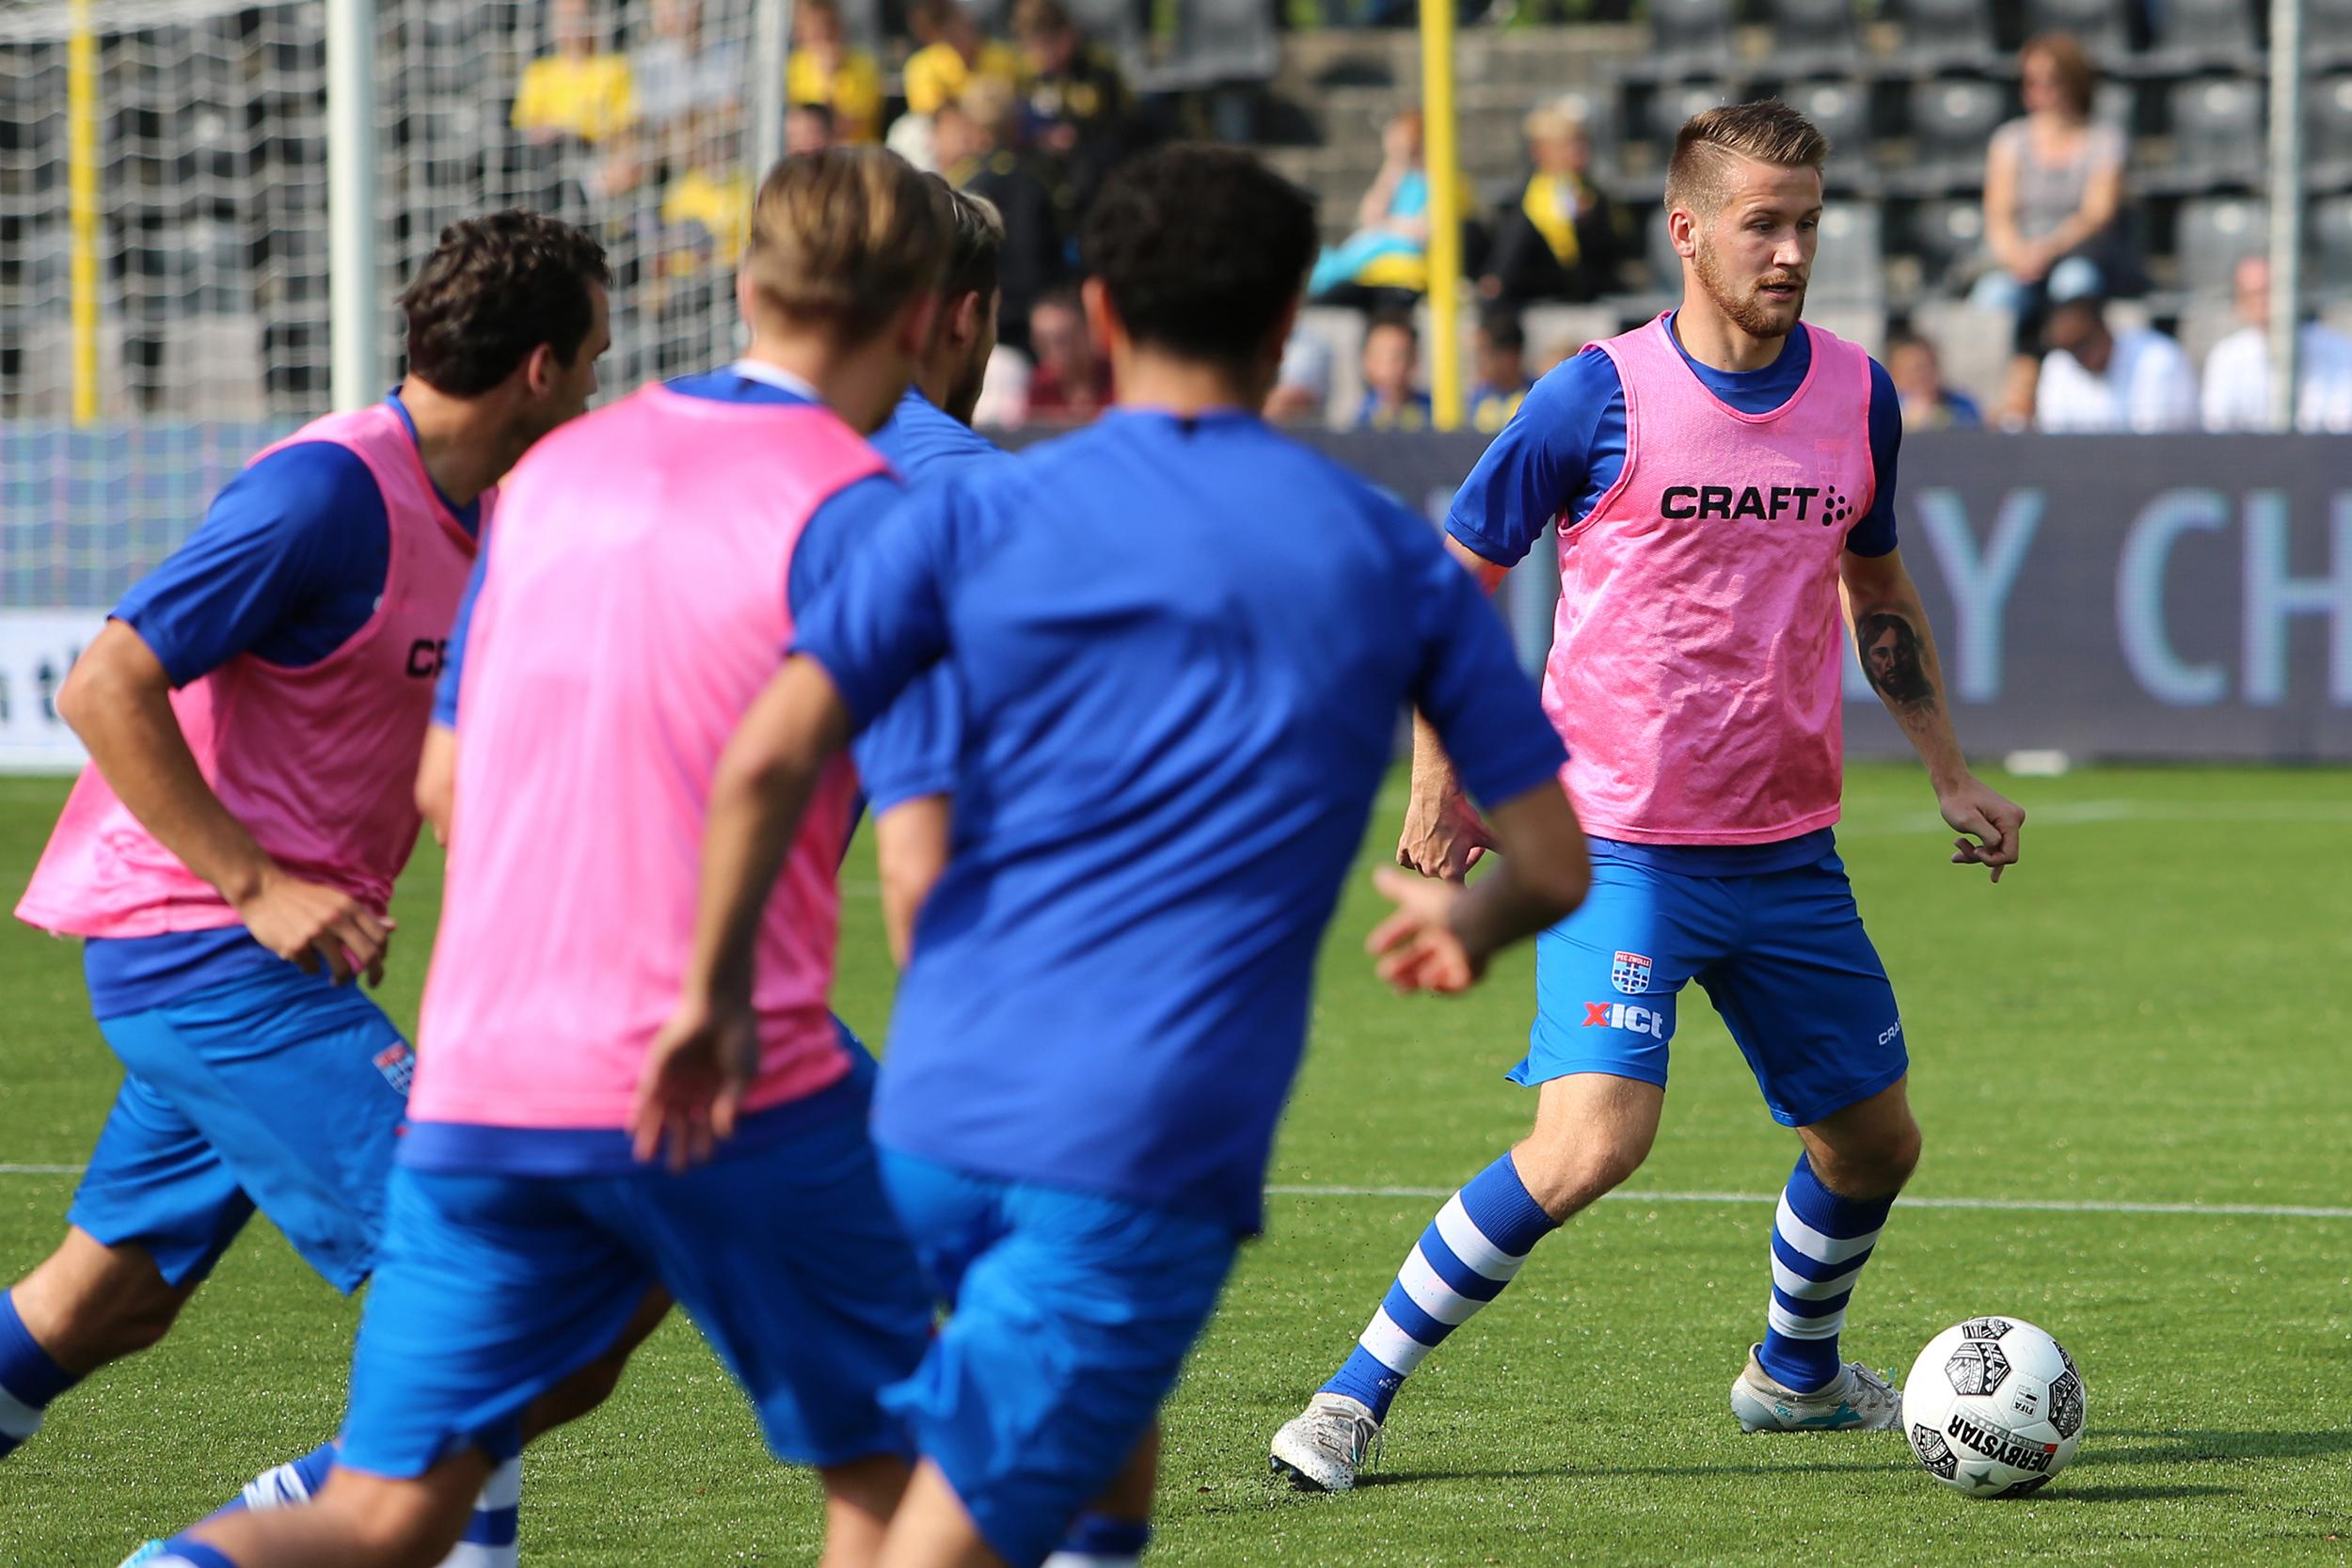 VVV Venlo - PEC Zwolle 1-1